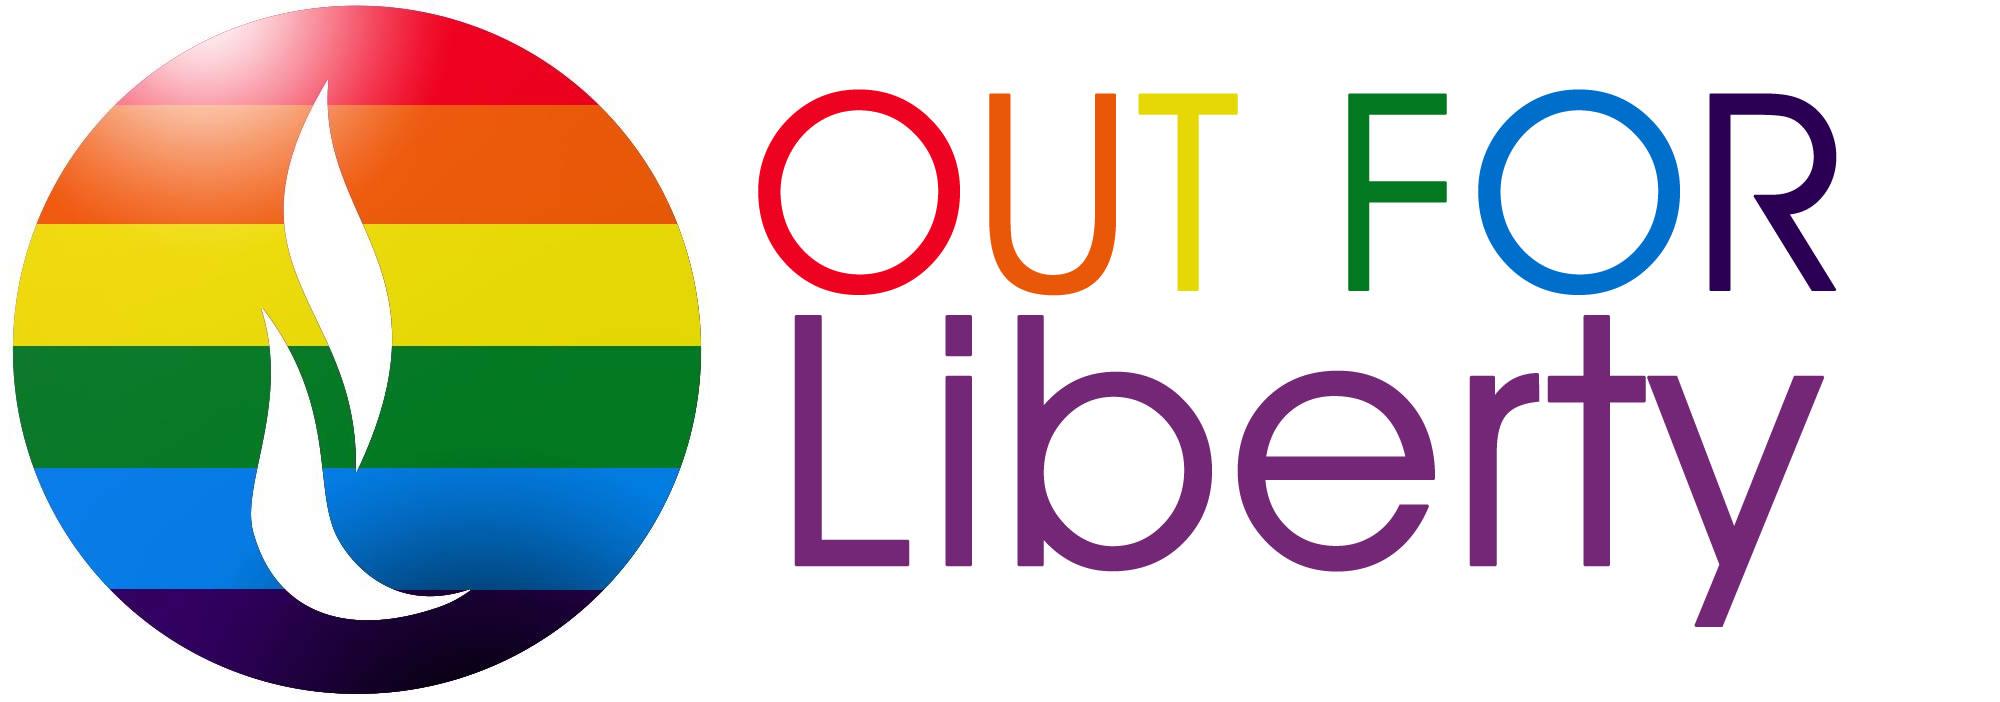 outForLiberty-2.jpg